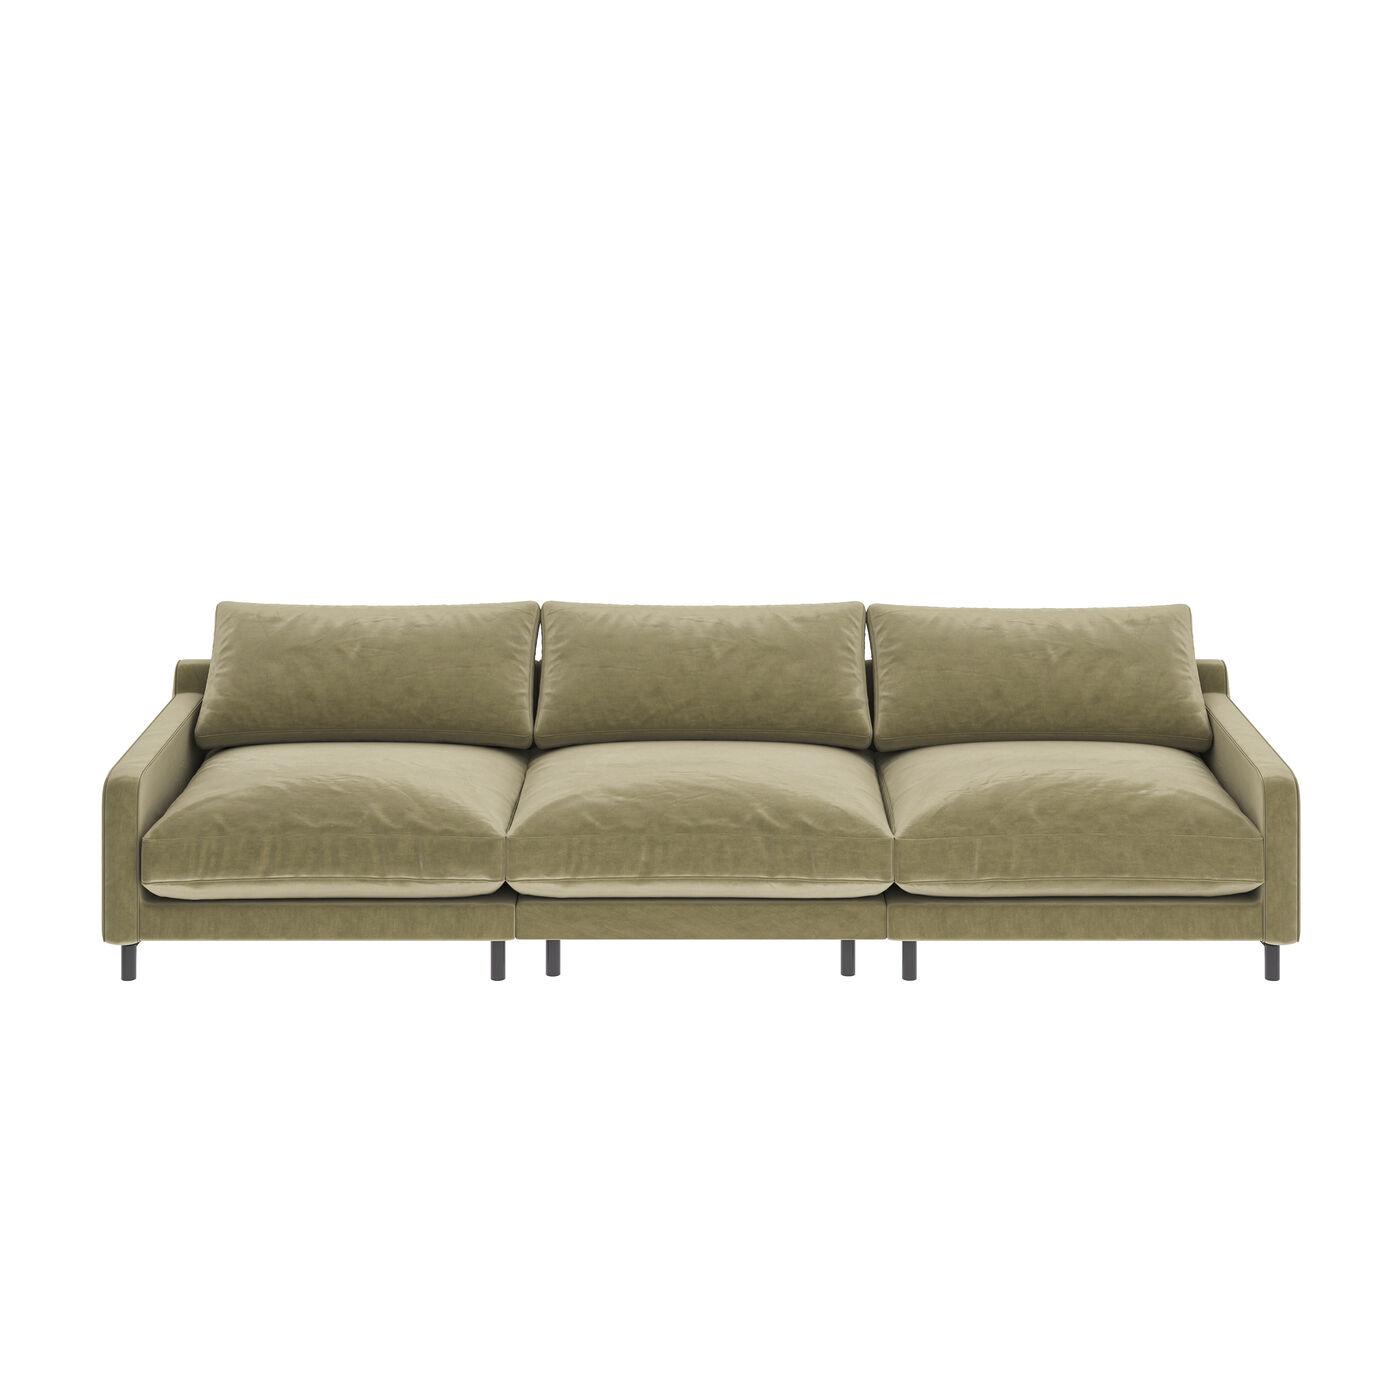 Sofa Discovery 3-Sitzer Oliv